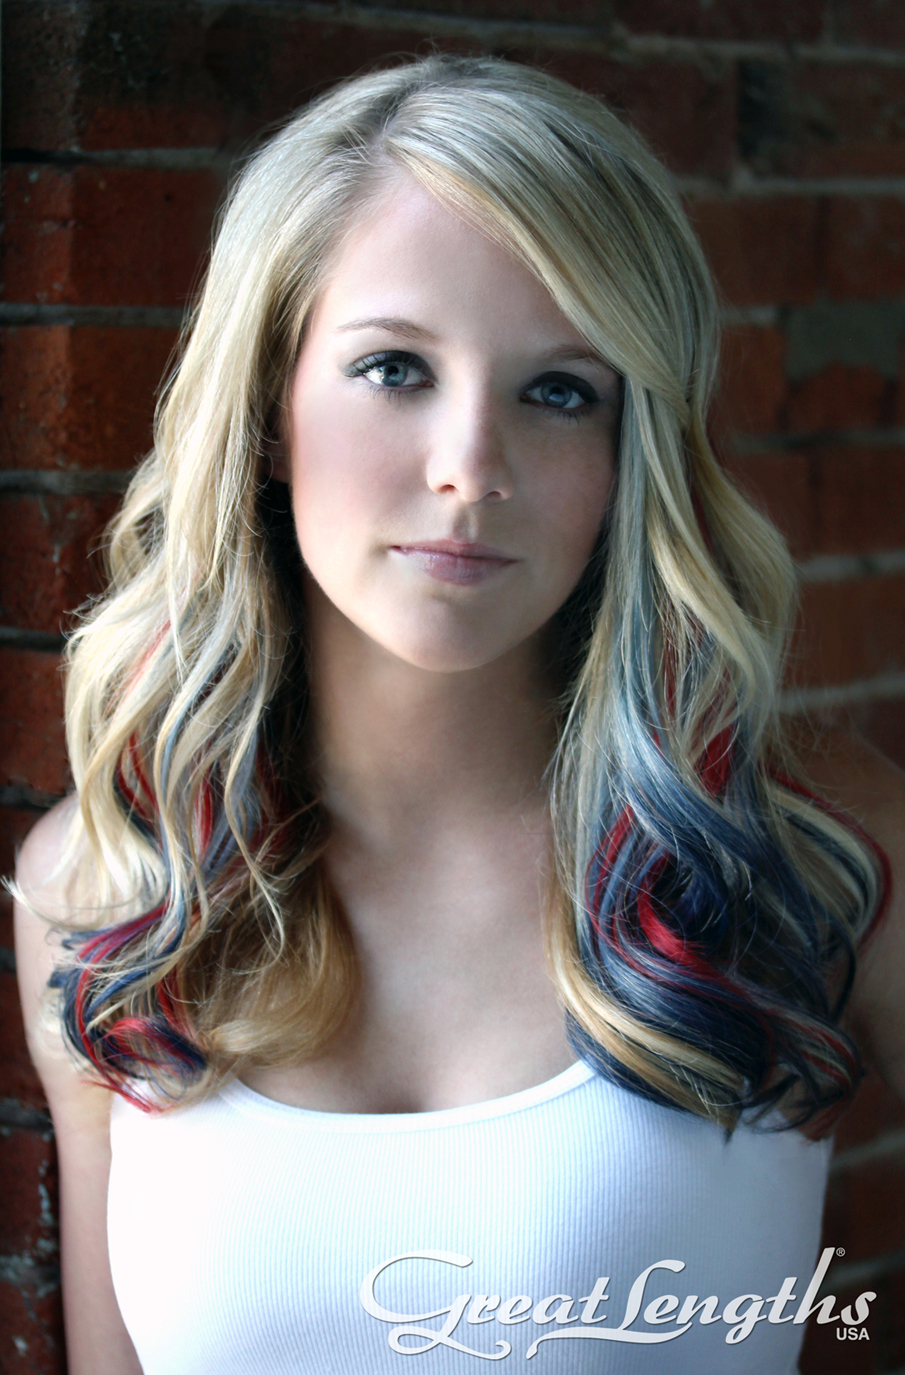 Creative Hair Design Blog Insanely Creative Hair Design